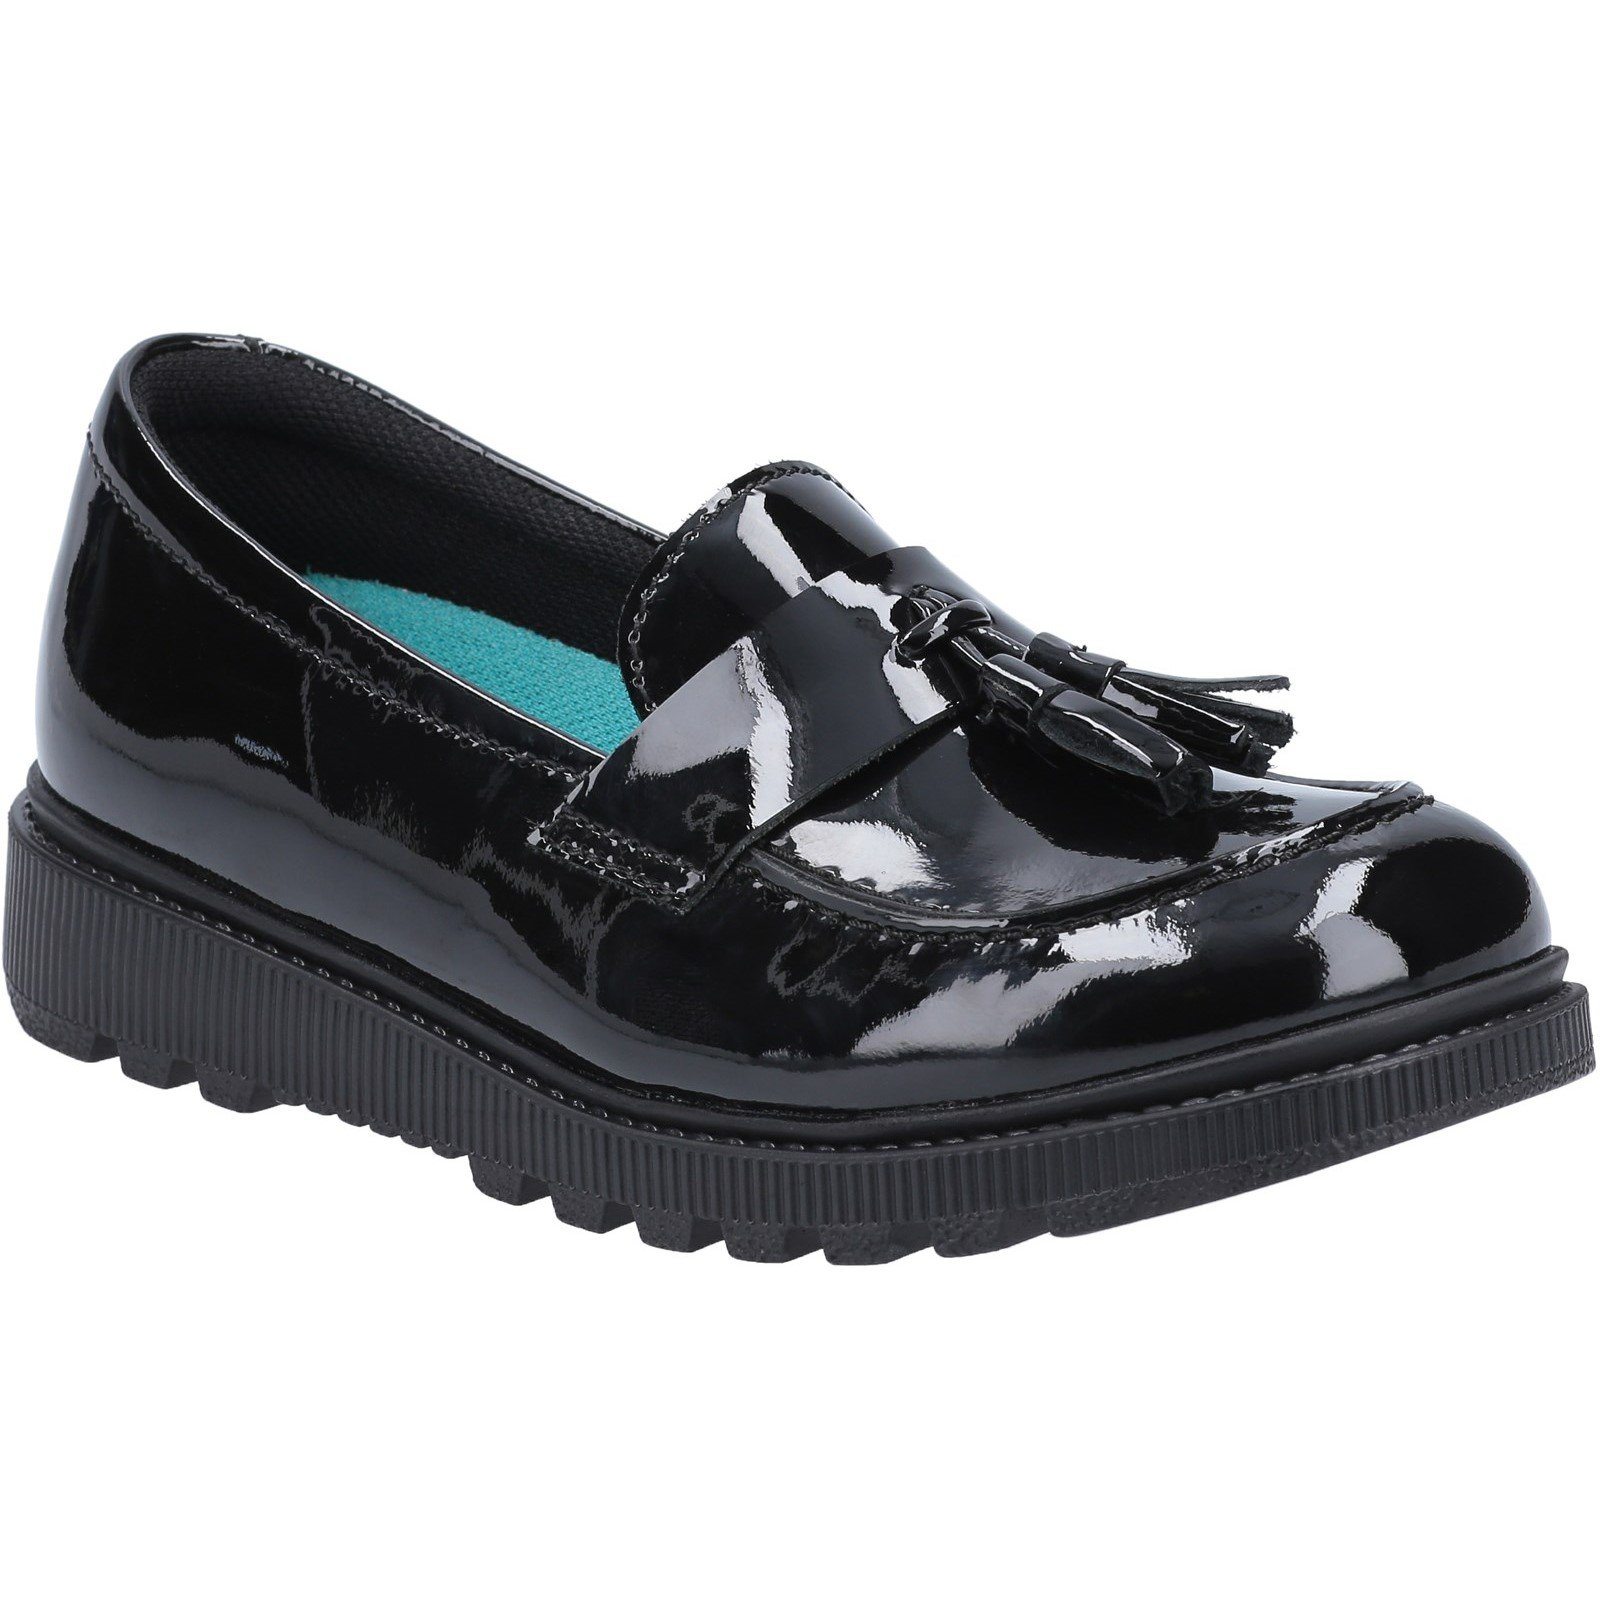 Hush Puppies Kid's Karen Junior School Shoe Patent Black 30827 - Patent Black 13